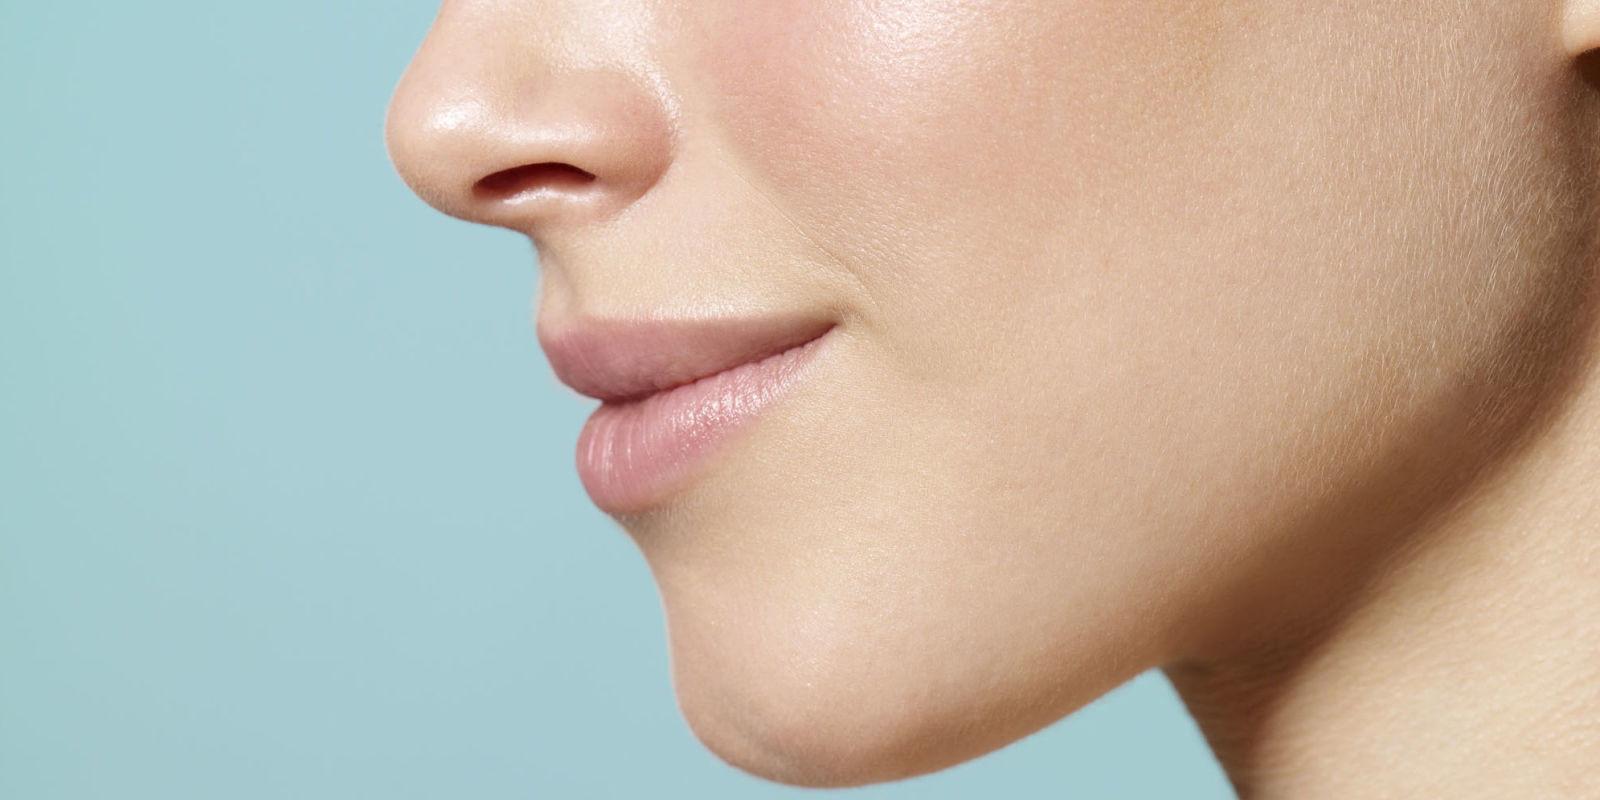 24 Tips to Save Money on Cosmetics, Makeup & Toiletries